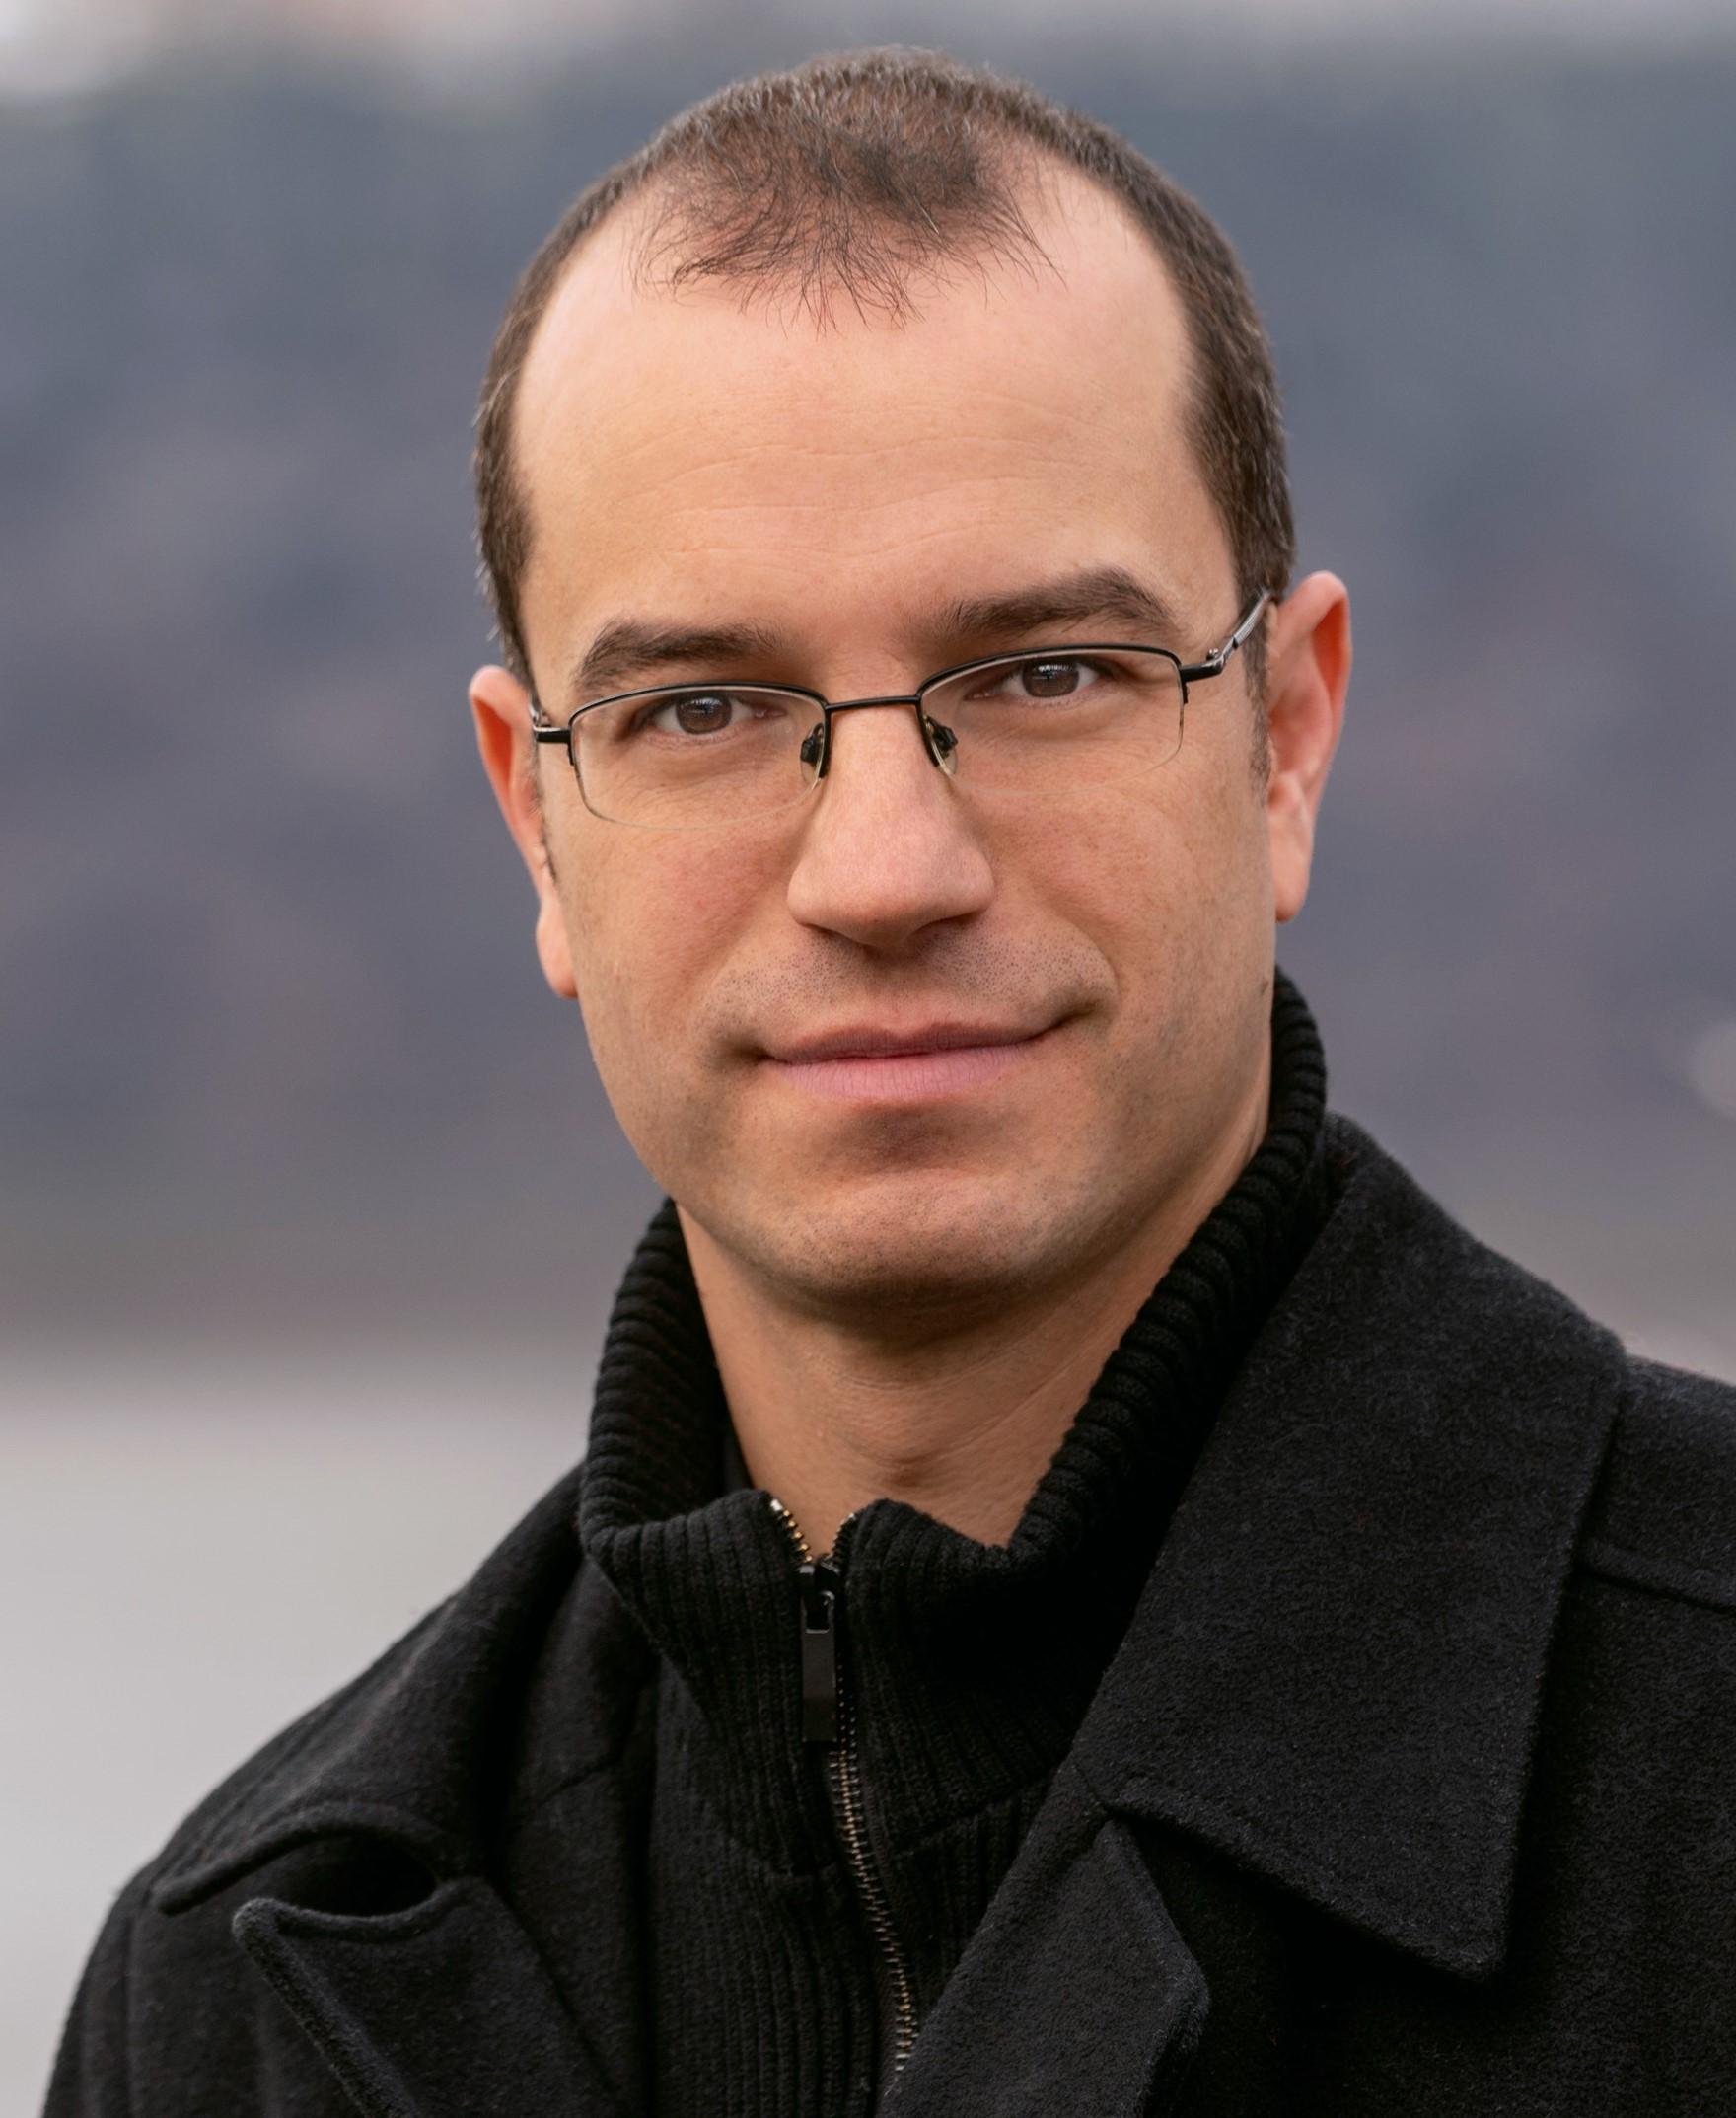 Aaron Galligan-Stierle